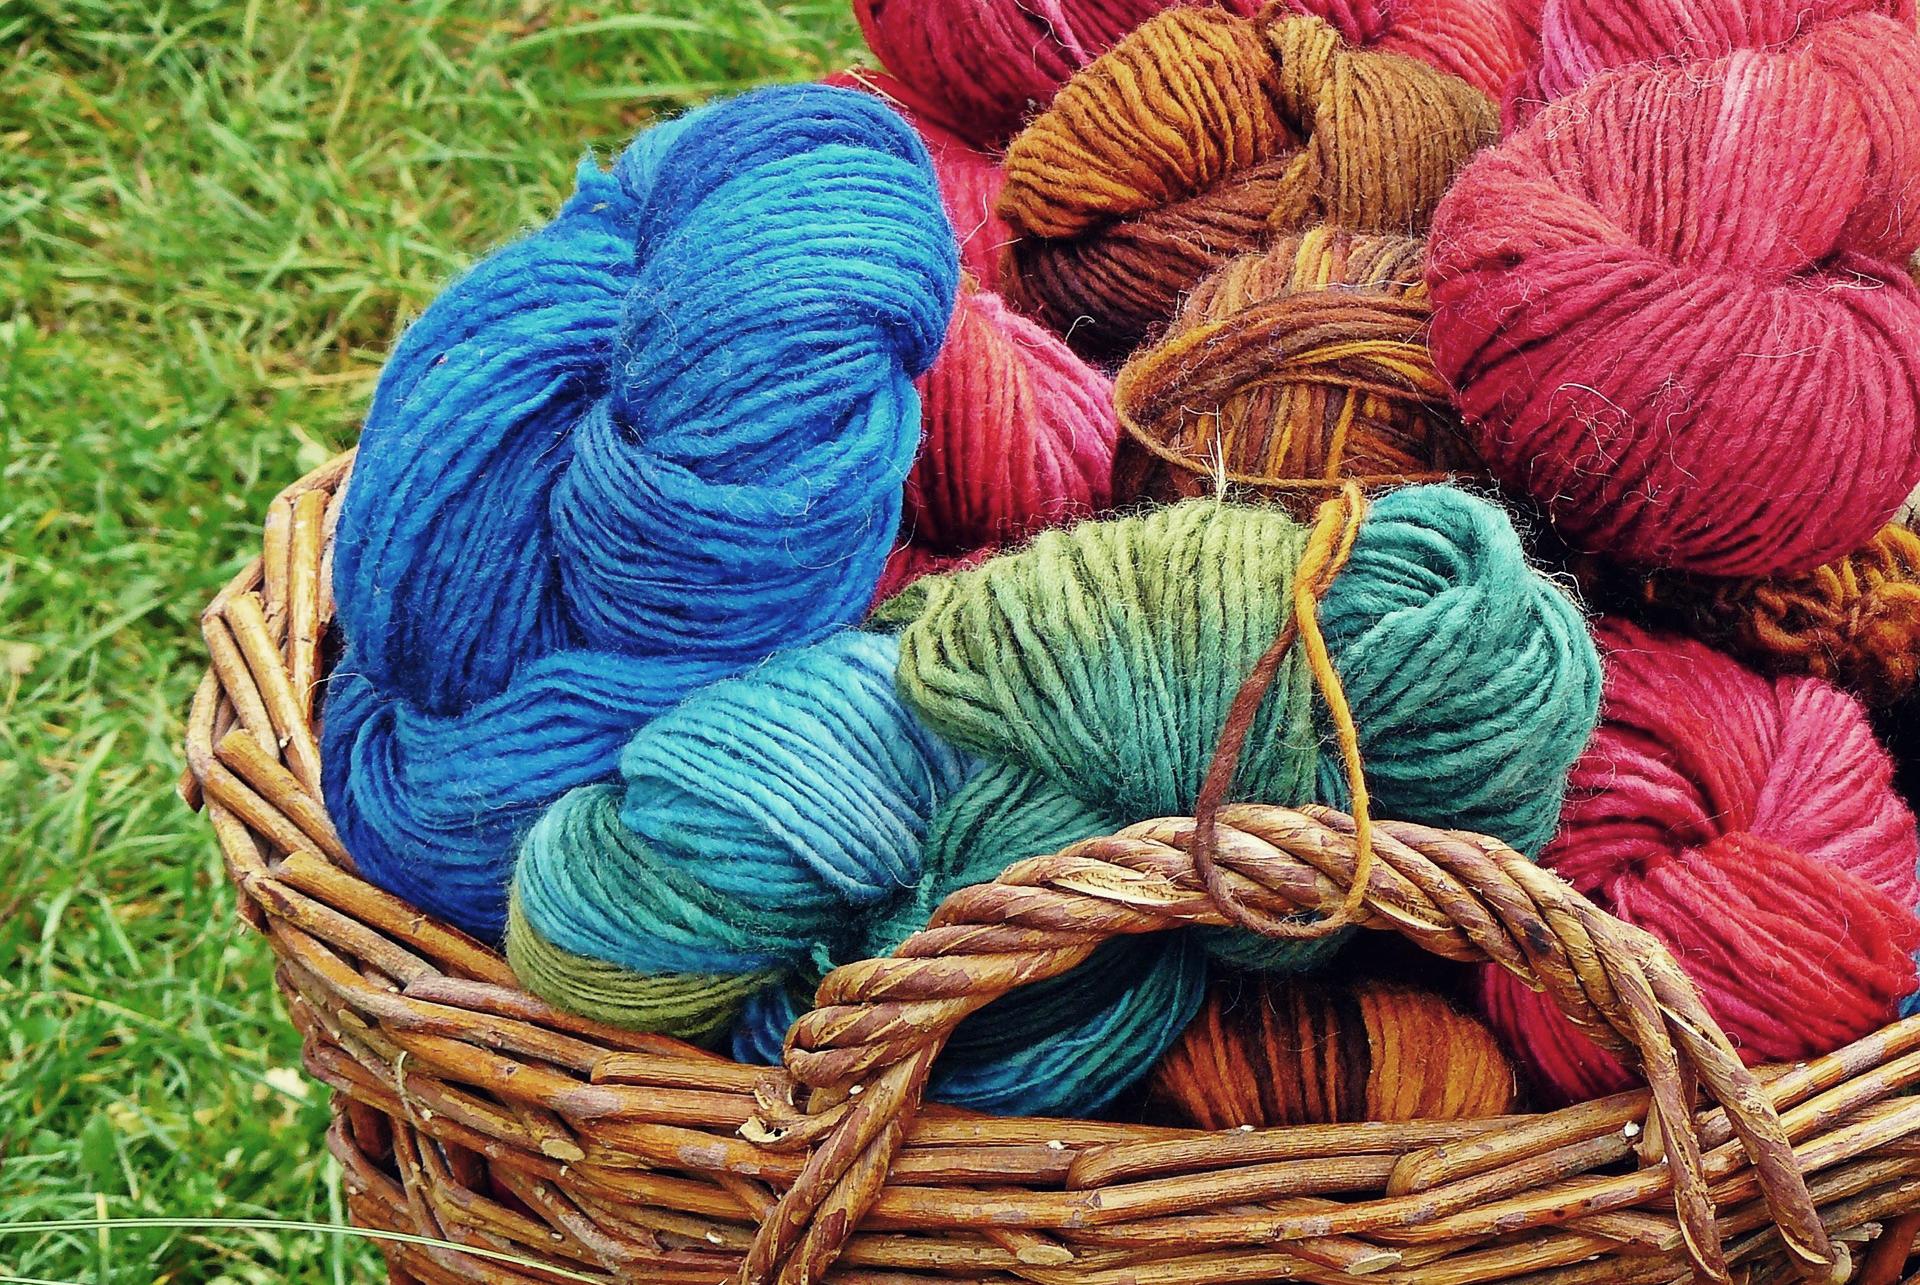 yarn-basket.jpg